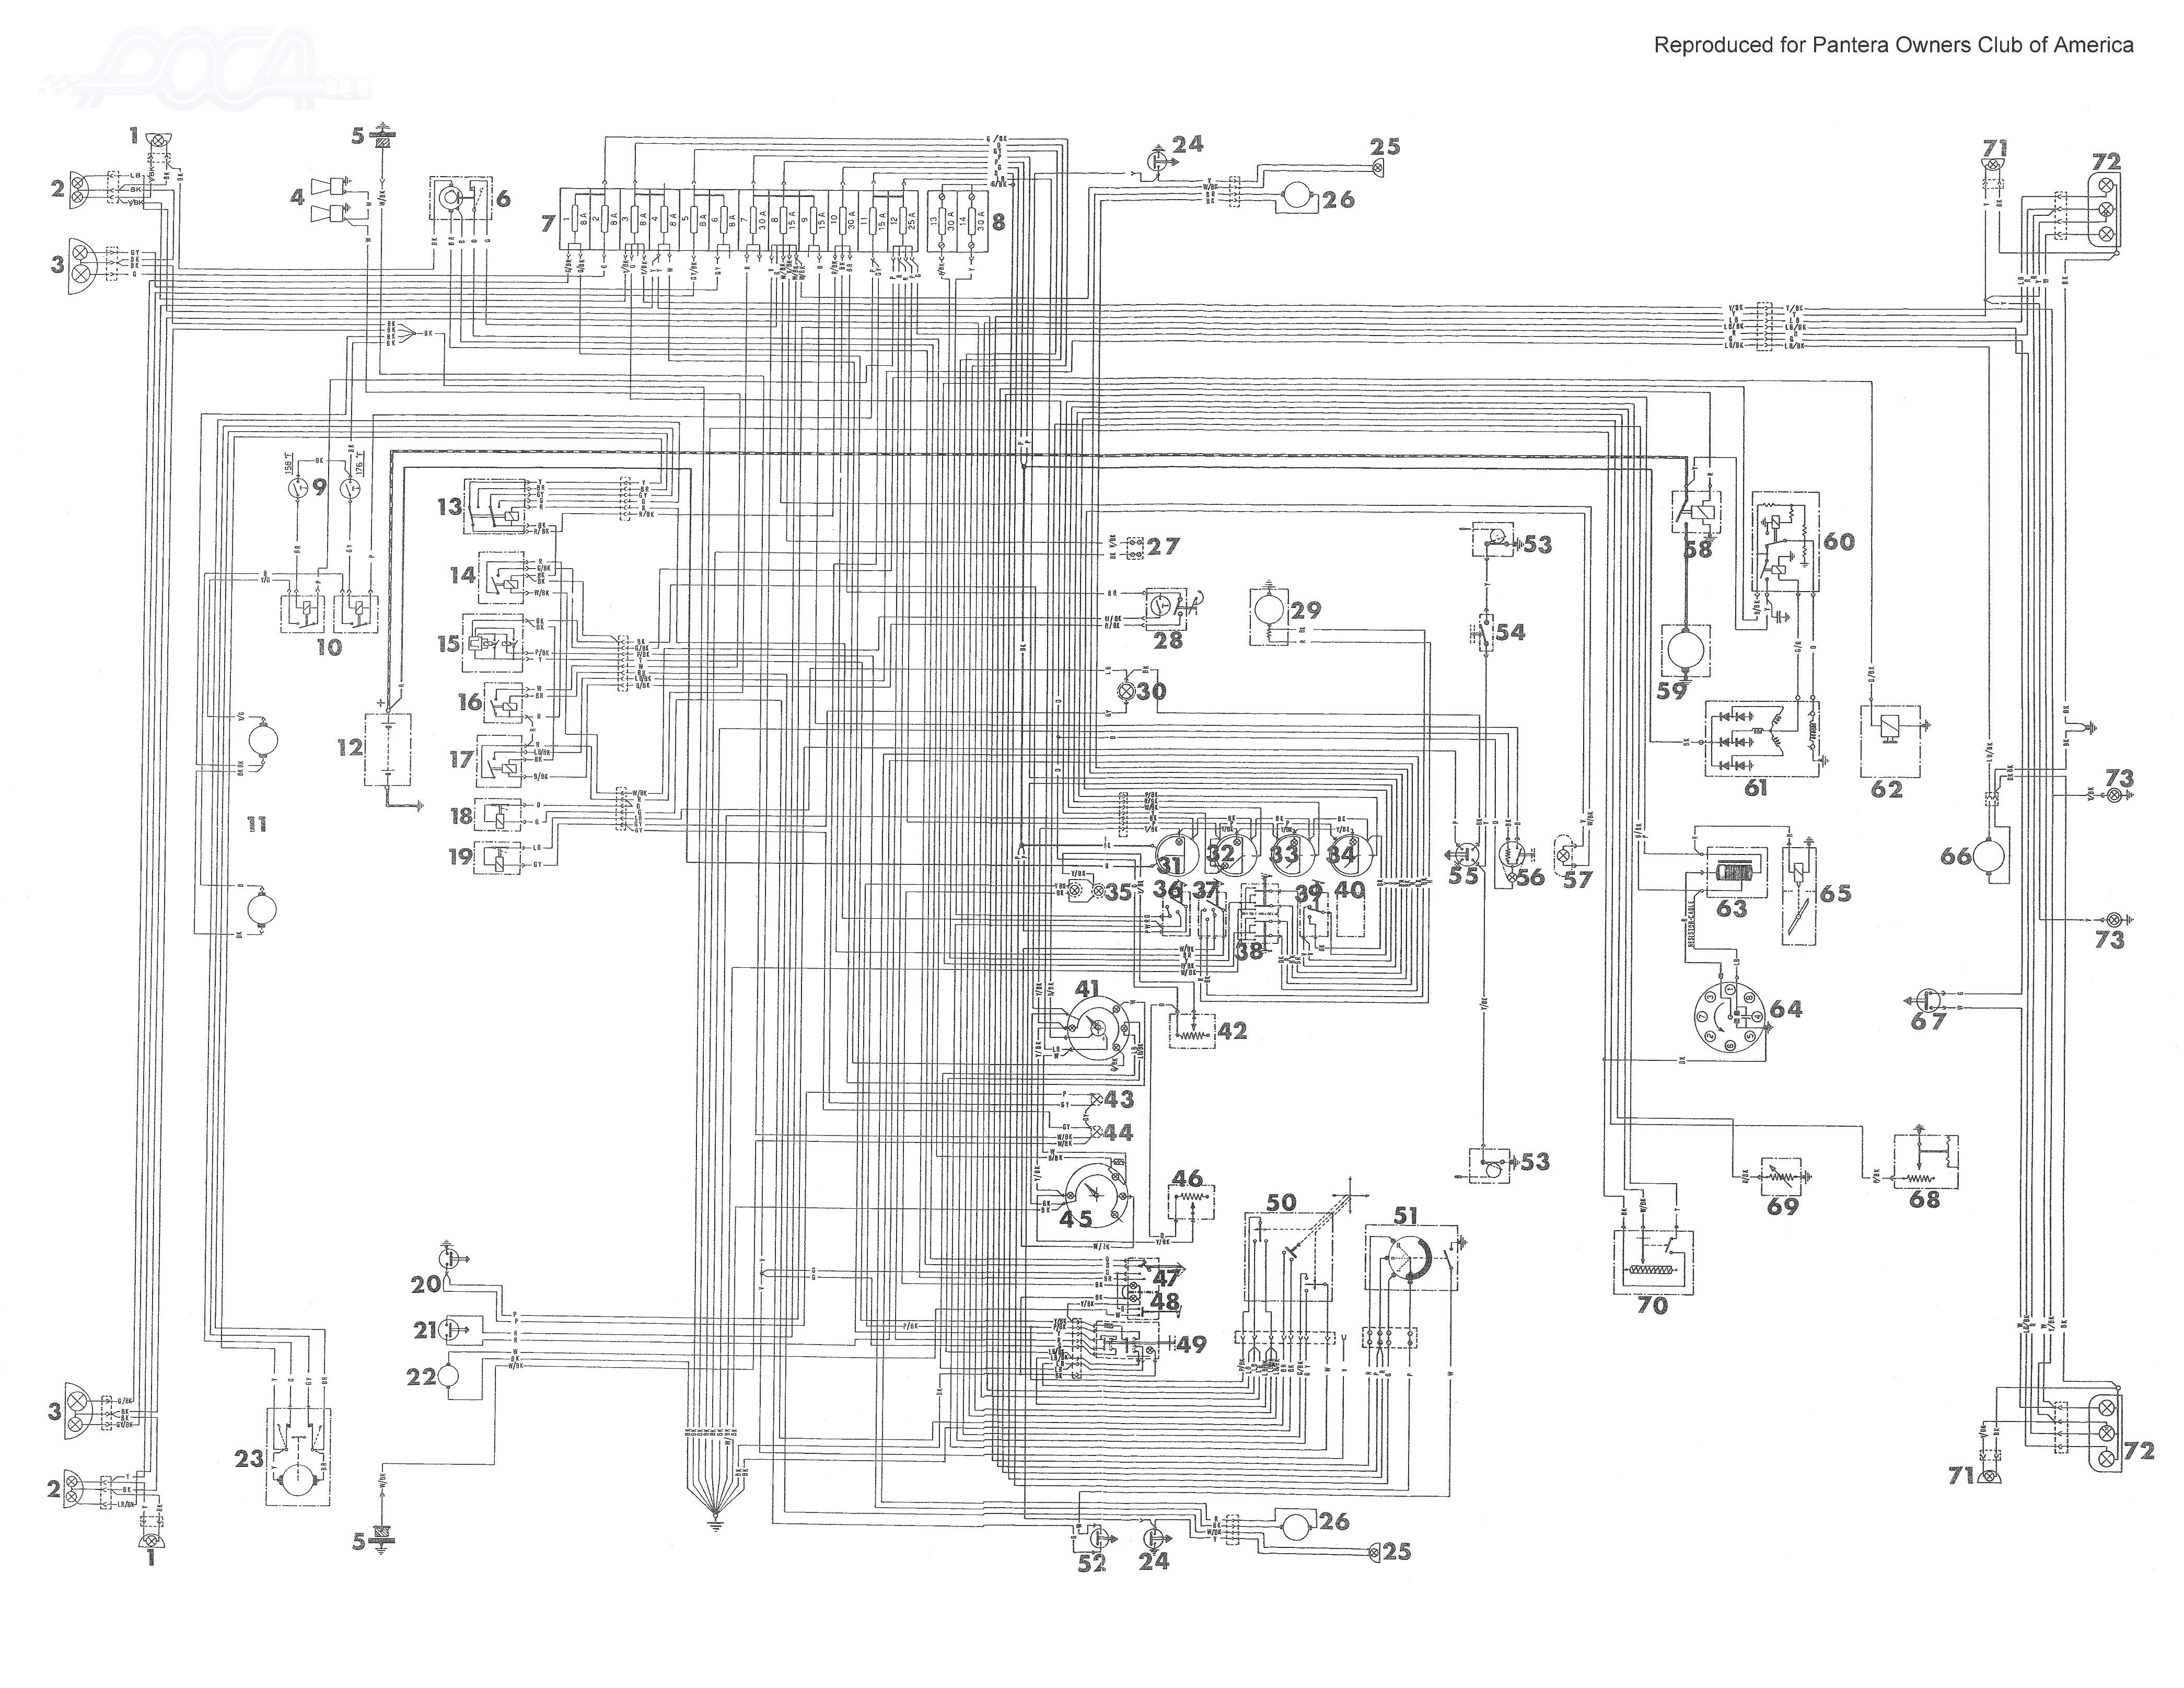 kenworth wiring diagram on international 7600 wiring diagrams wire rh linxglobal co Kenworth Truck Wiring Diagrams 2004 kenworth t800 wiring schematic